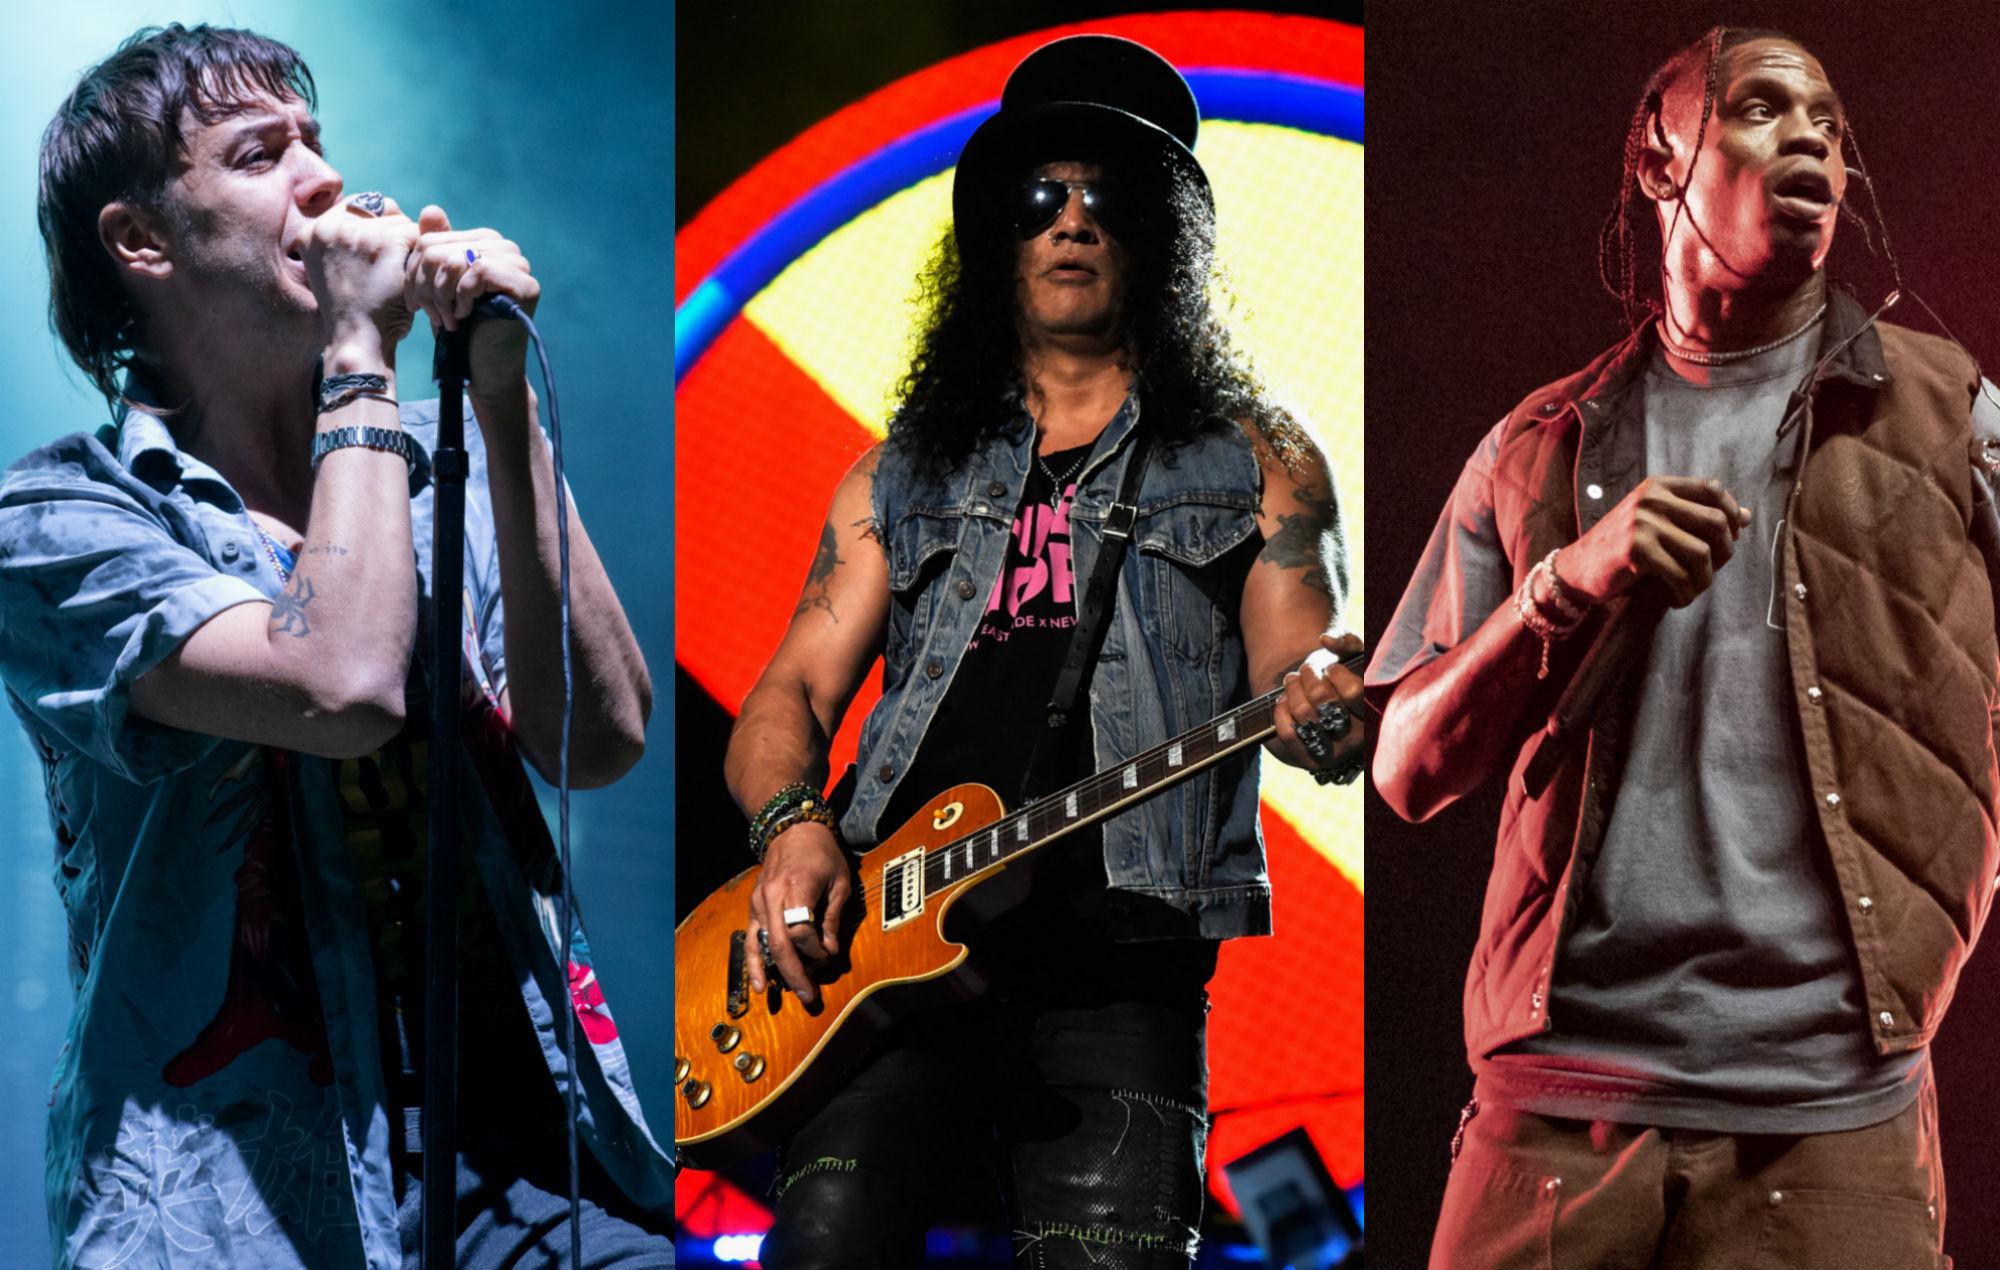 The Strokes / Guns N' Roses / Travis Scott